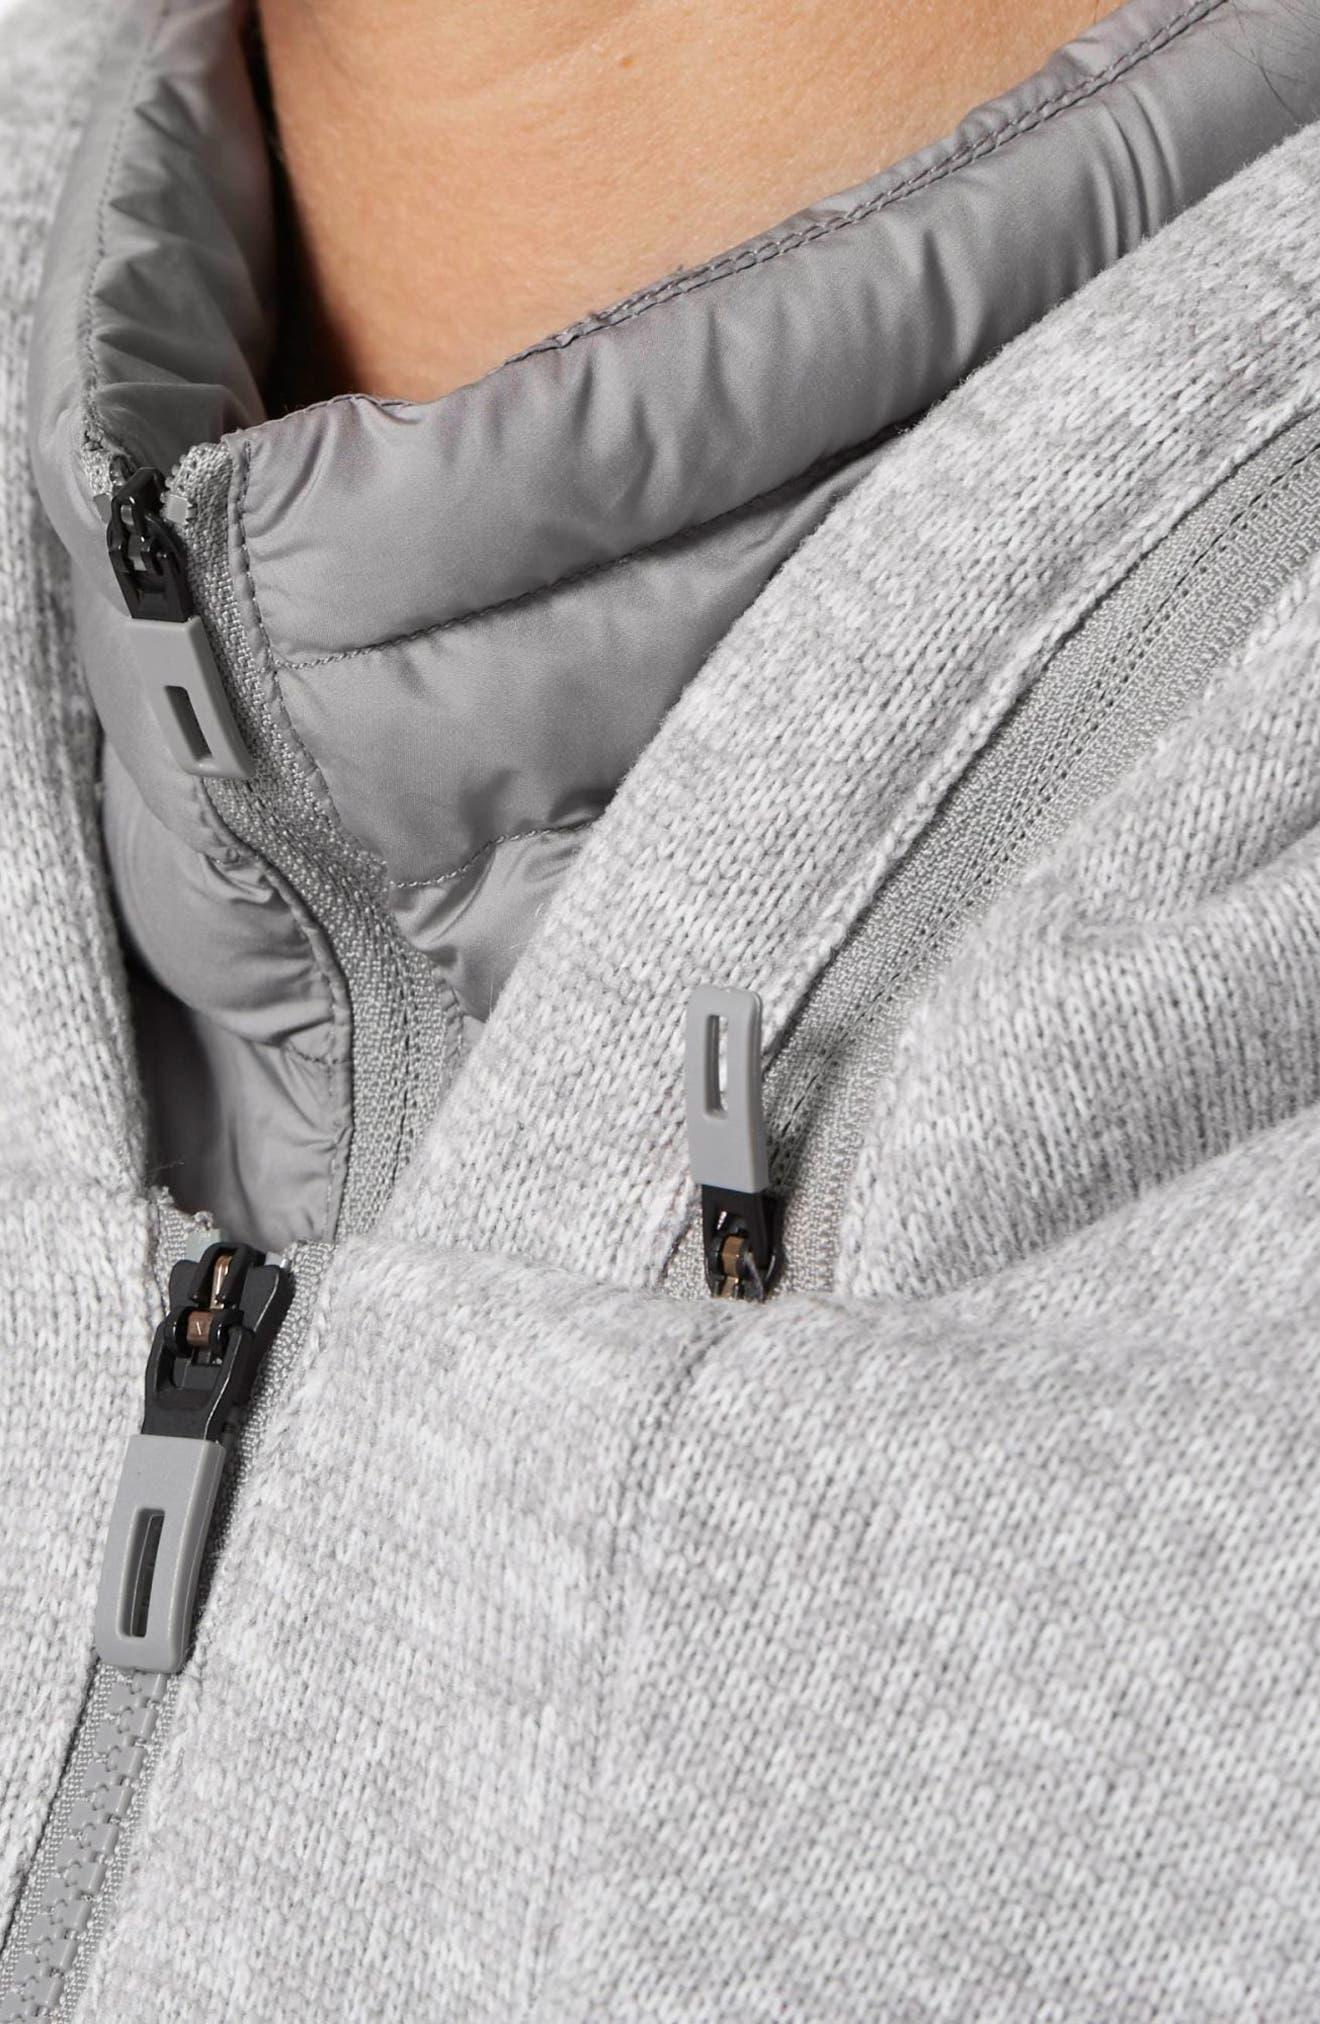 Nuvic Hybrid 2 Fleece/Puffer Jacket,                             Alternate thumbnail 4, color,                             Medium Grey Heather/Solid Grey